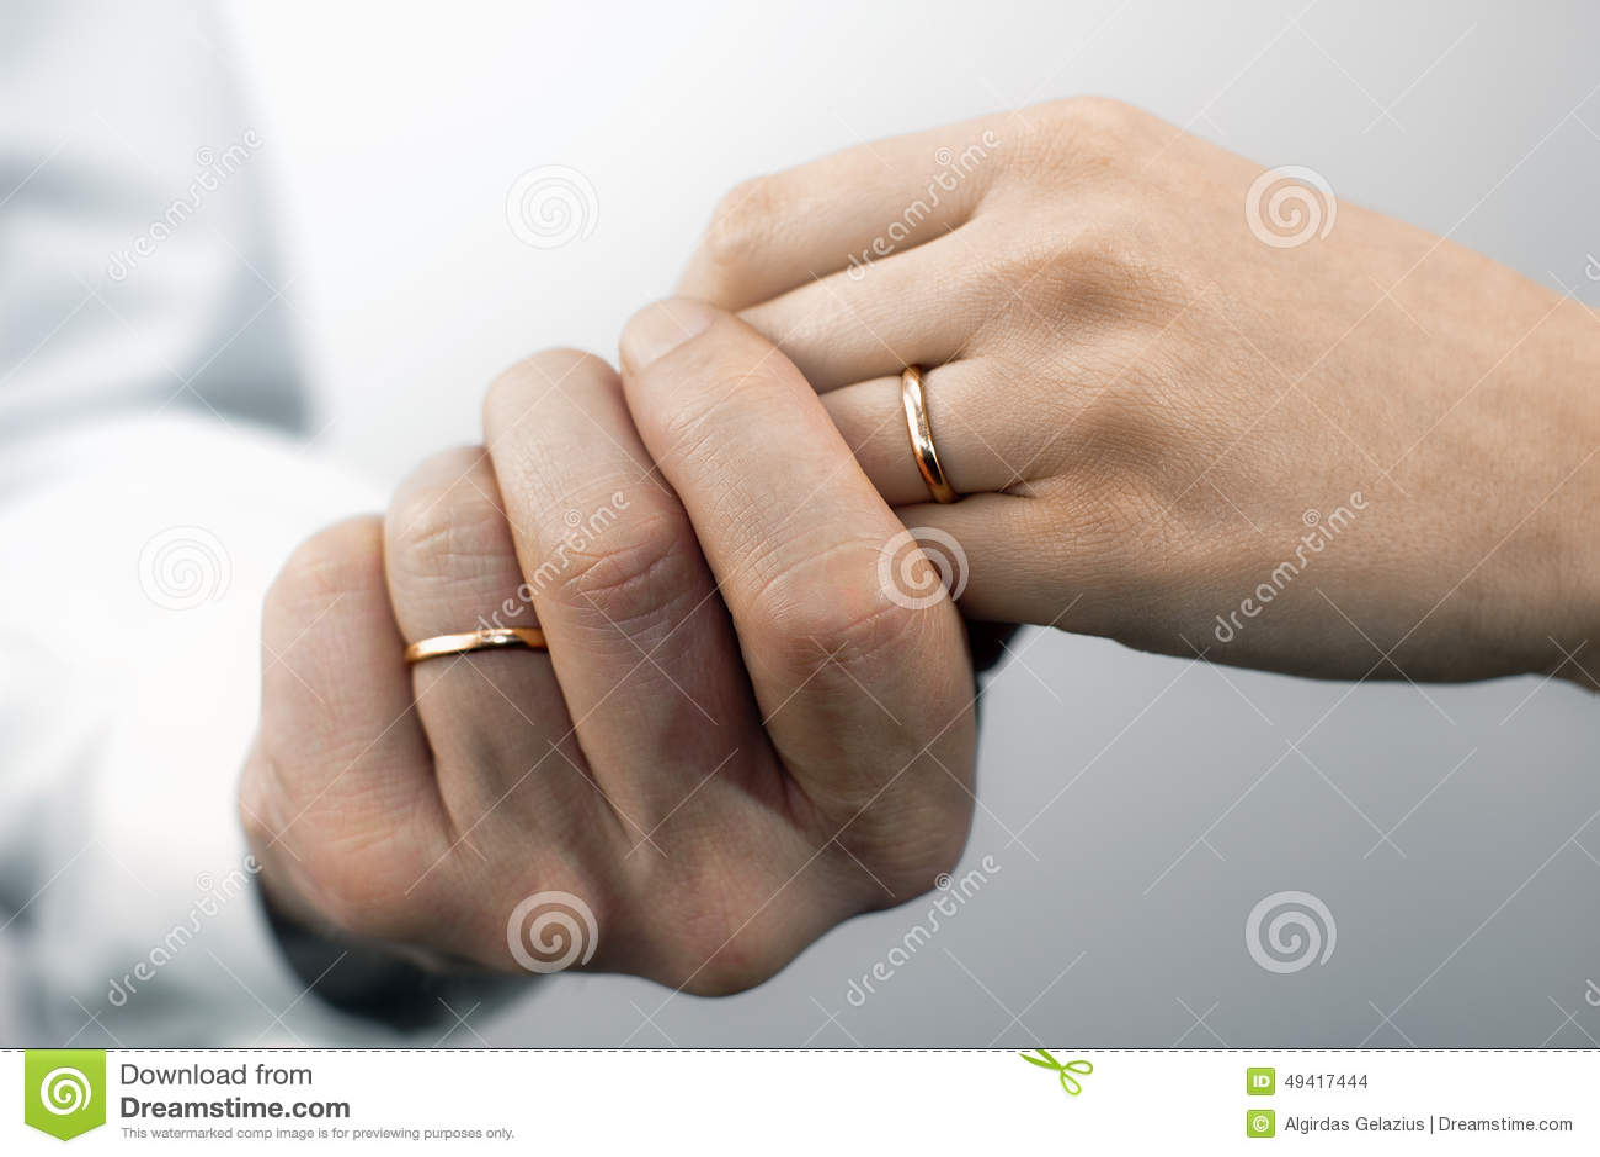 Man and woman wedding